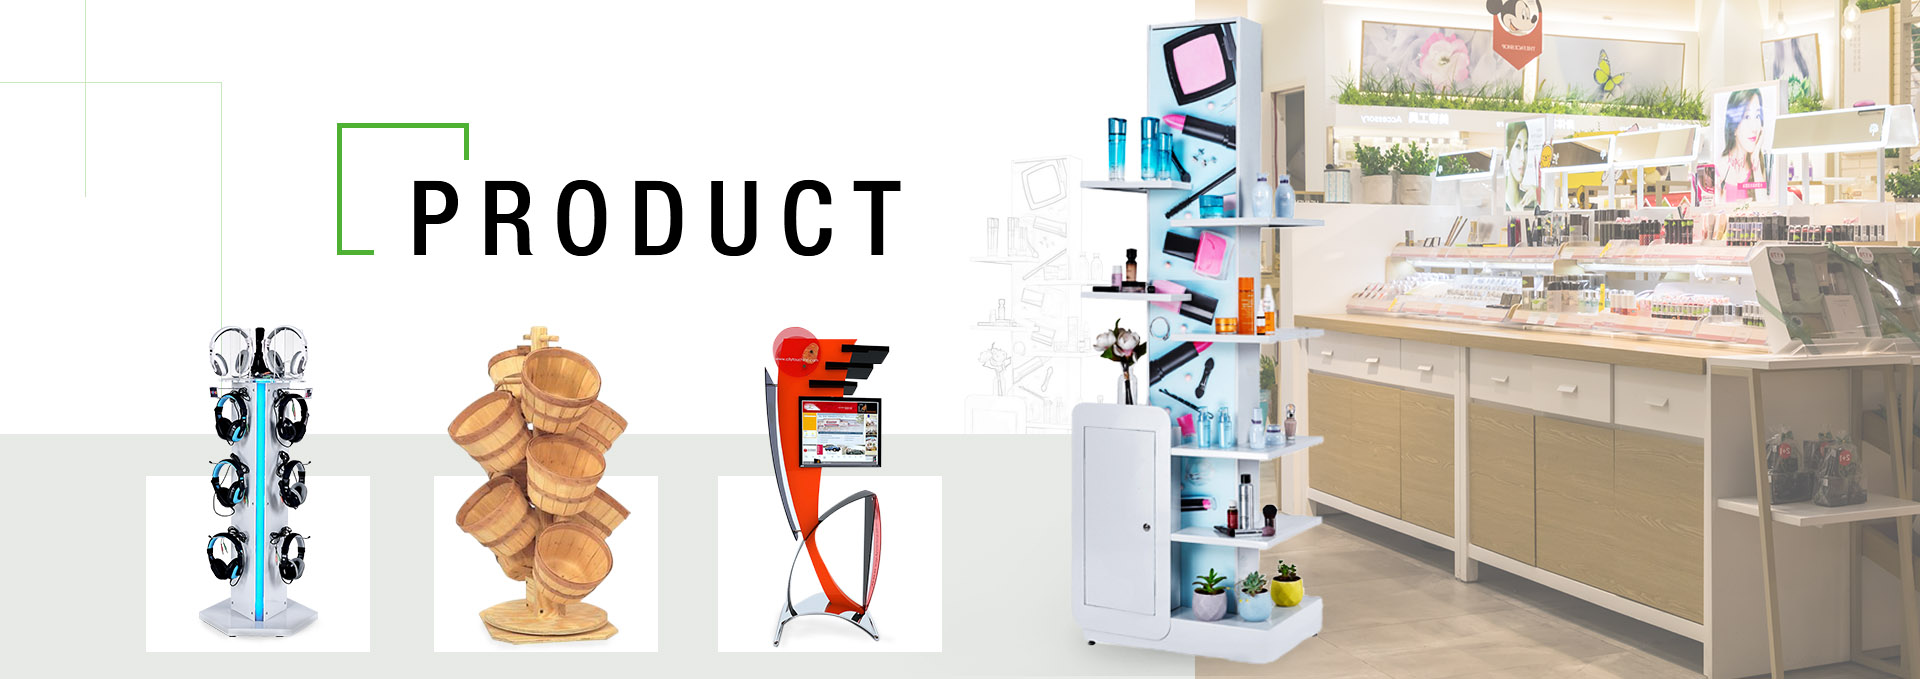 category-Professional Shelves And Display   Display Stand   Product-YISHANG-img